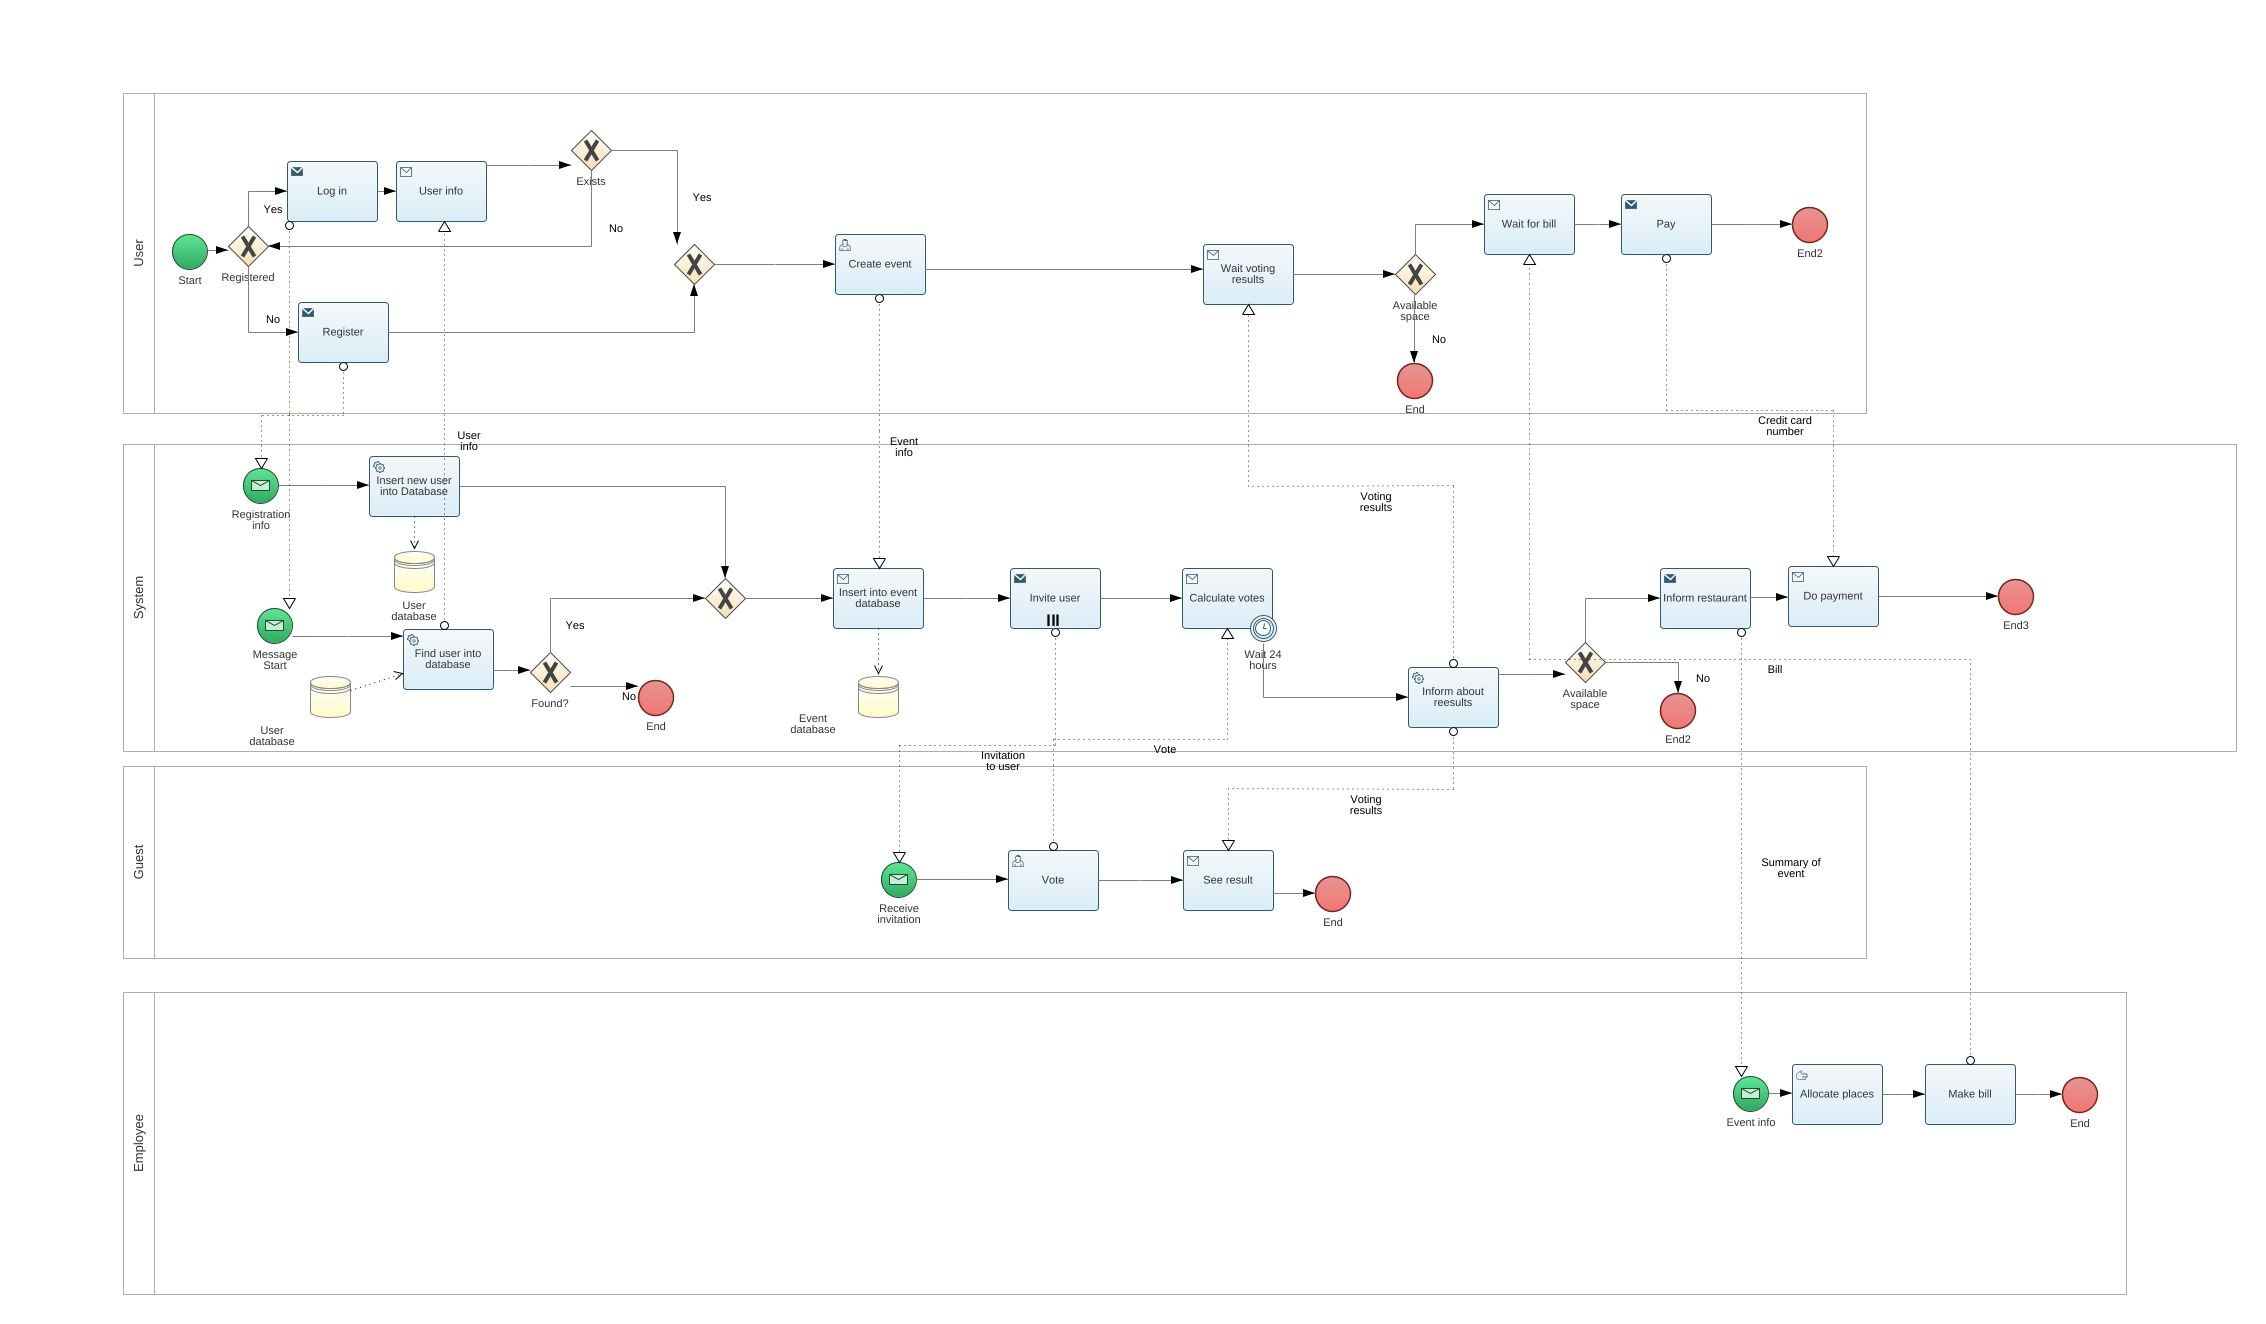 Restaurant bpmn2 diagram restaurant bpmn2 example bpmn2 jpeg png svg collaboration diagram ccuart Images